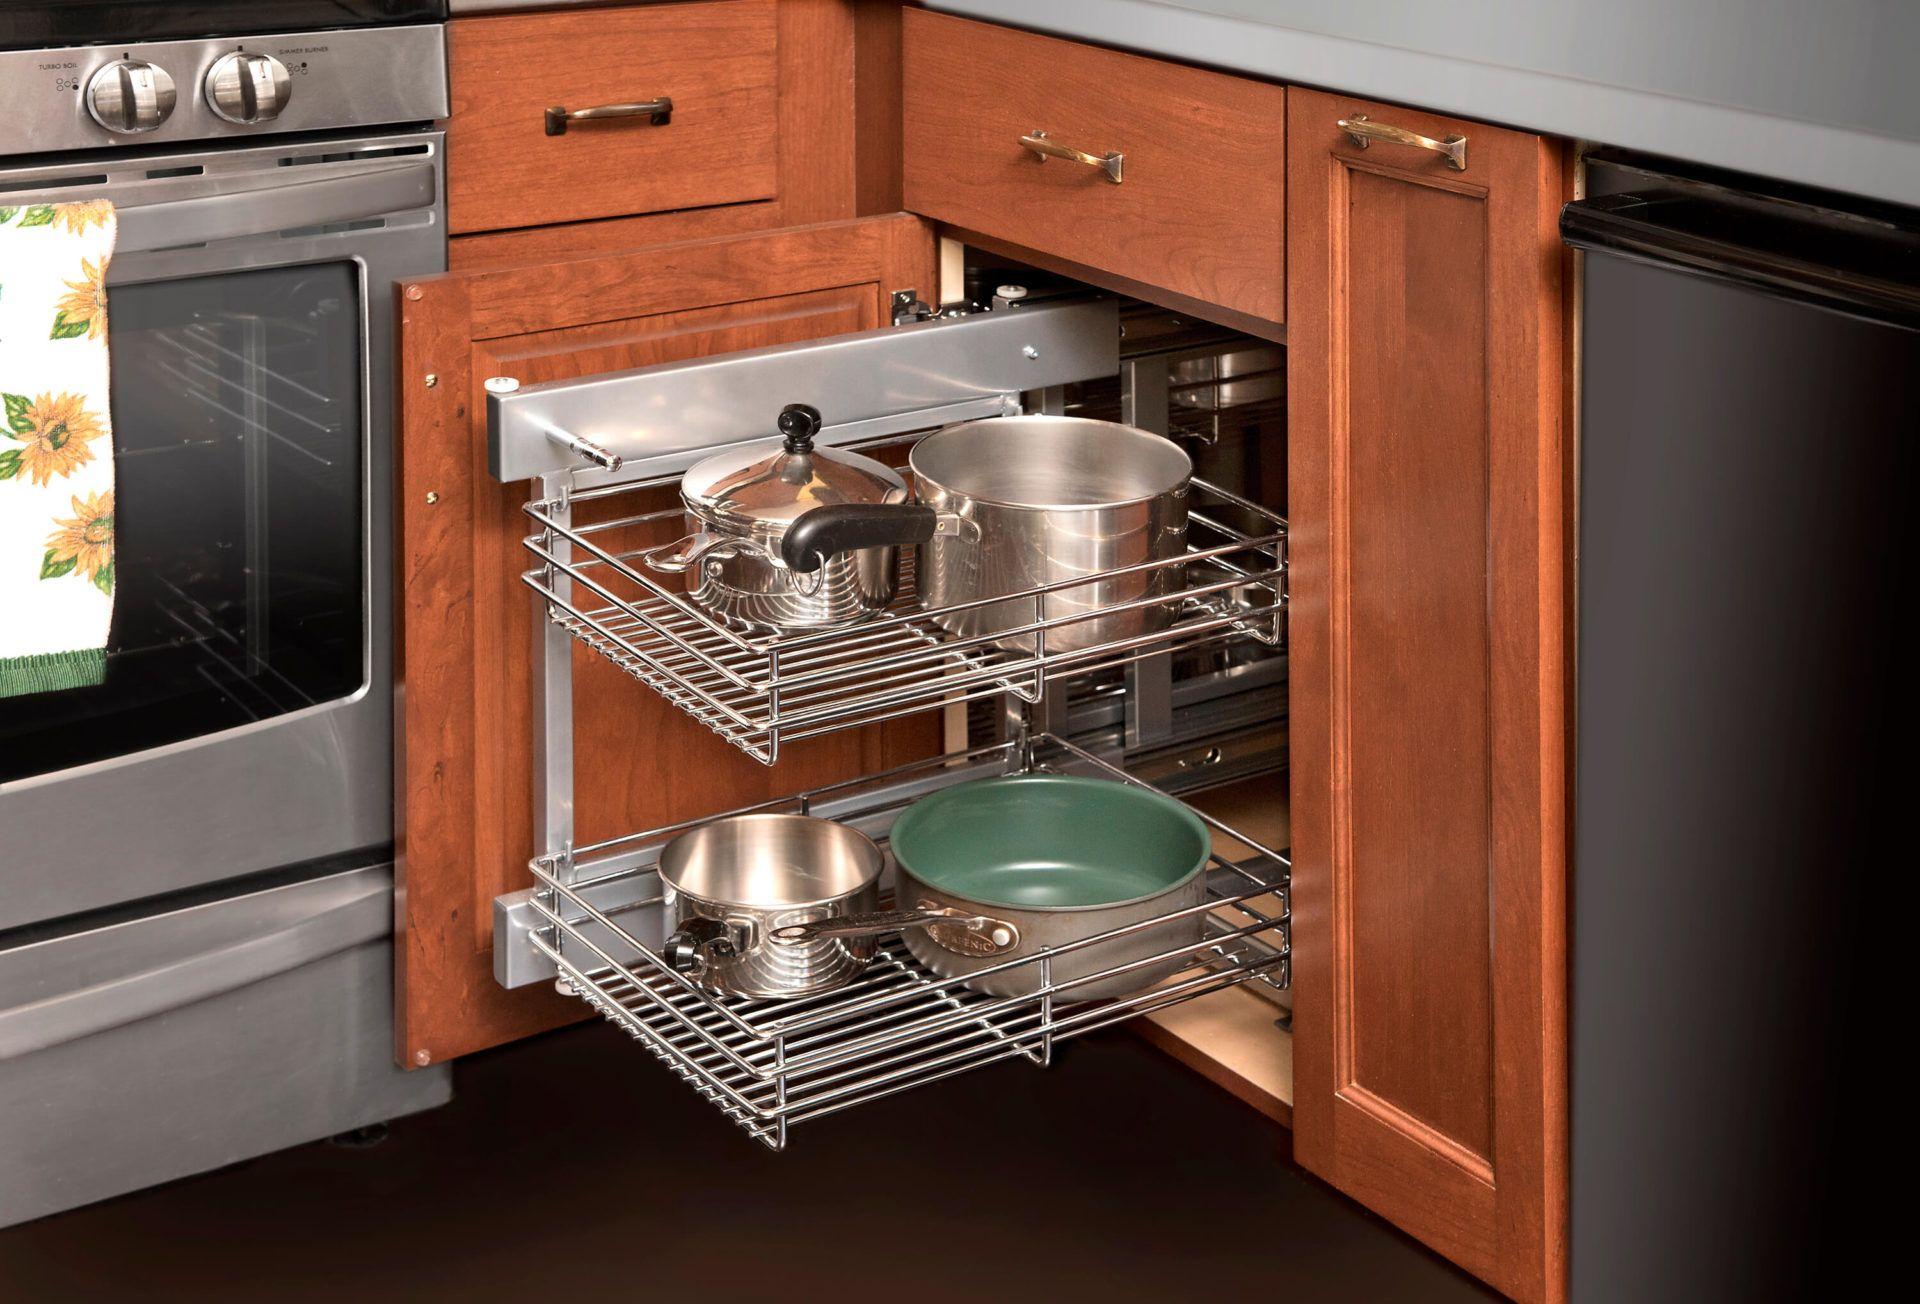 Kitchen Cabinet Refacing Gallery Kitchen Saver In 2020 Refacing Kitchen Cabinets Cabinet Refacing Kitchen Cabinets